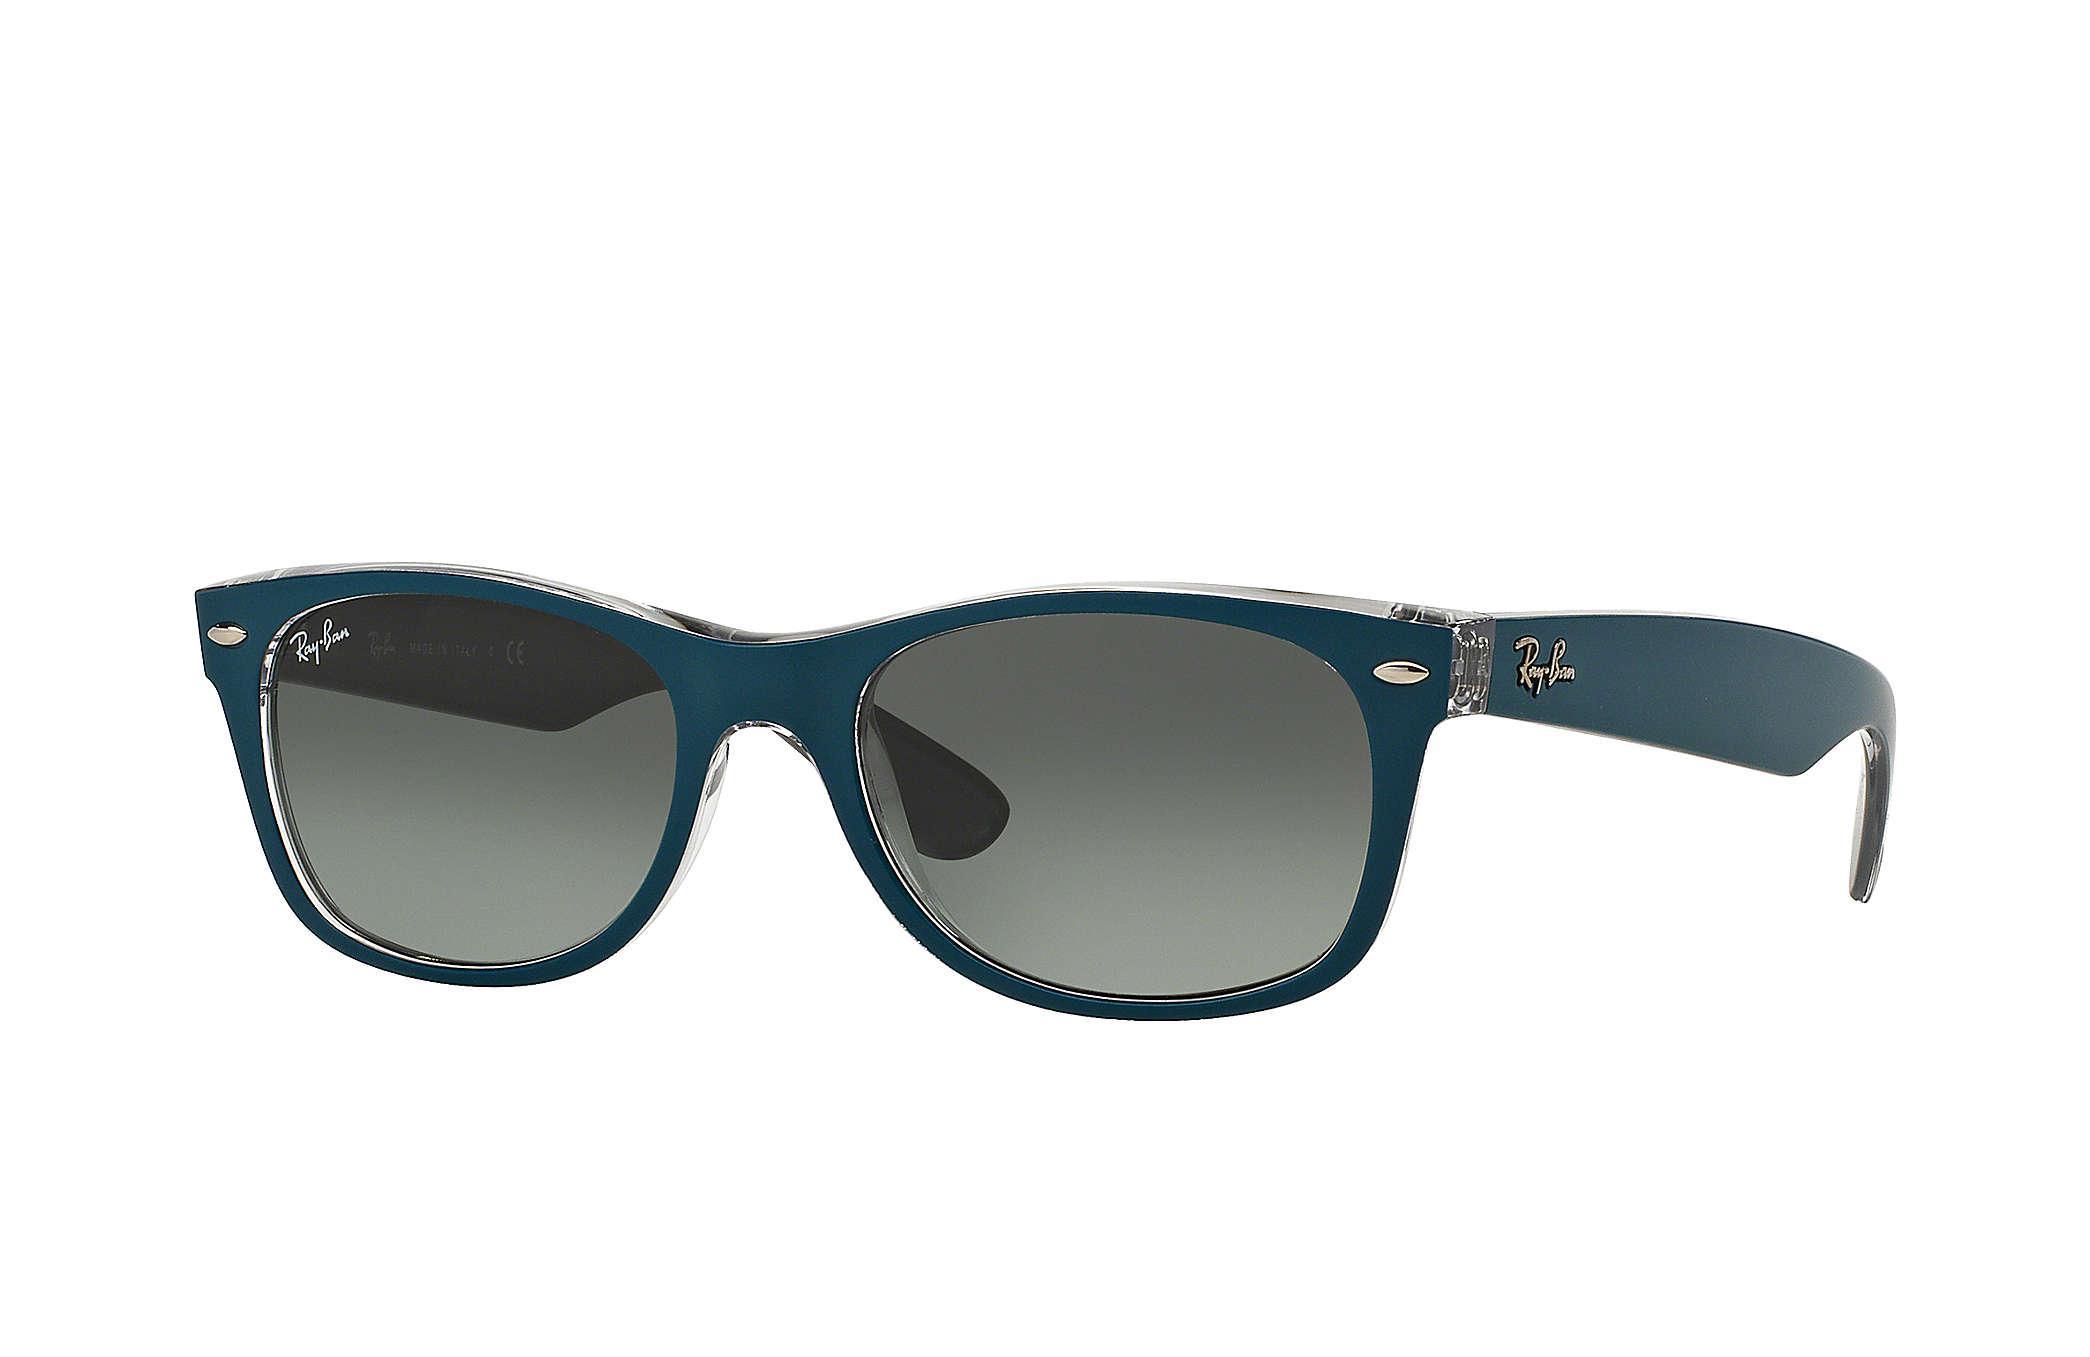 Ray-Ban New Wayfarer Bicolor in Blue for Men - Lyst f209b6290de3